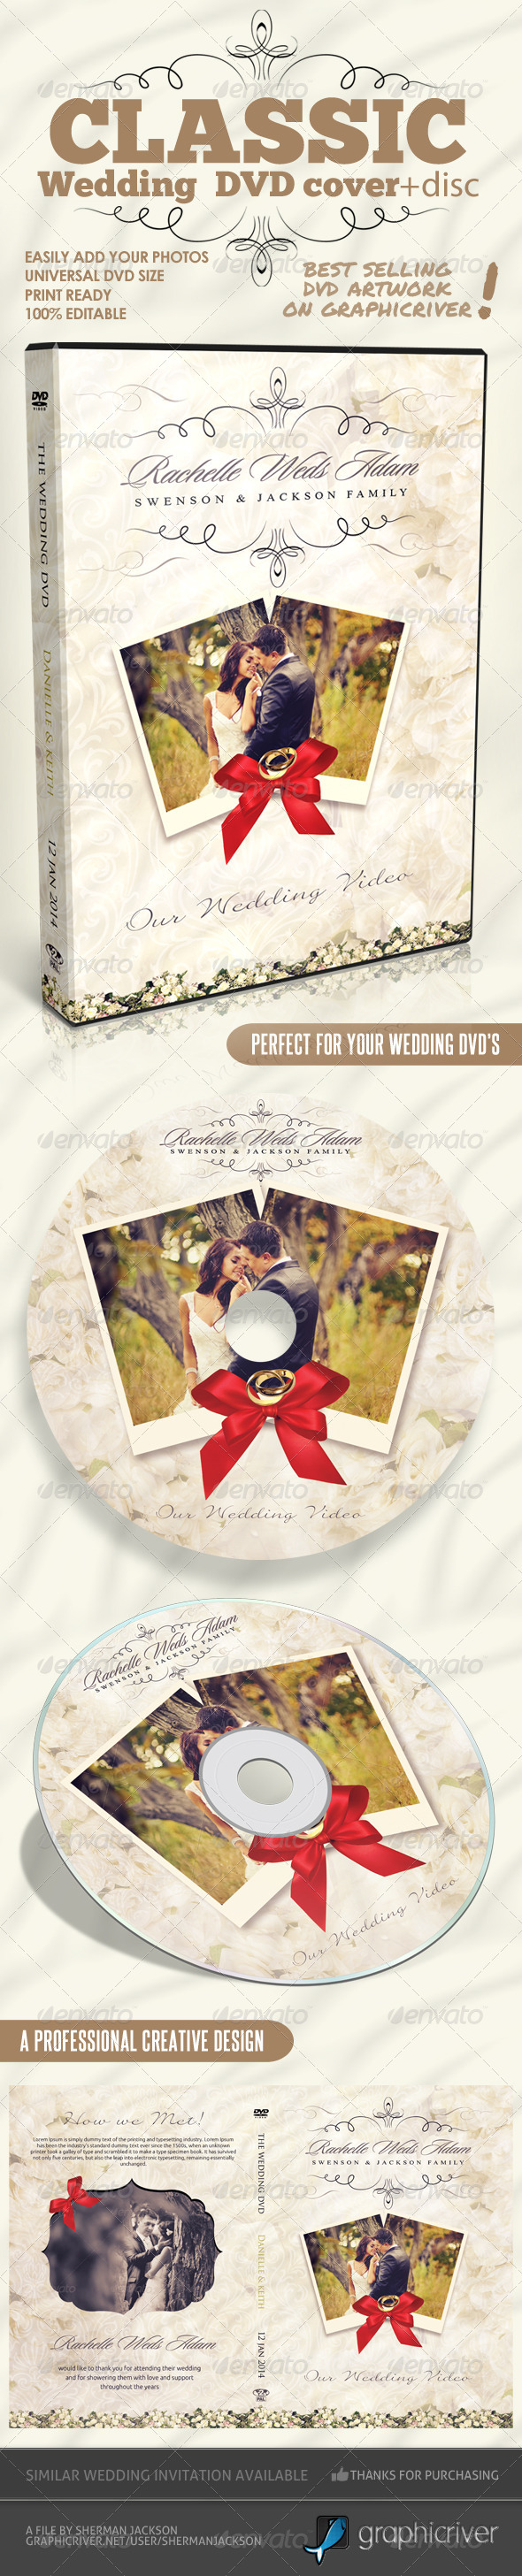 GraphicRiver Classique Wedding DVD Covers 6370014